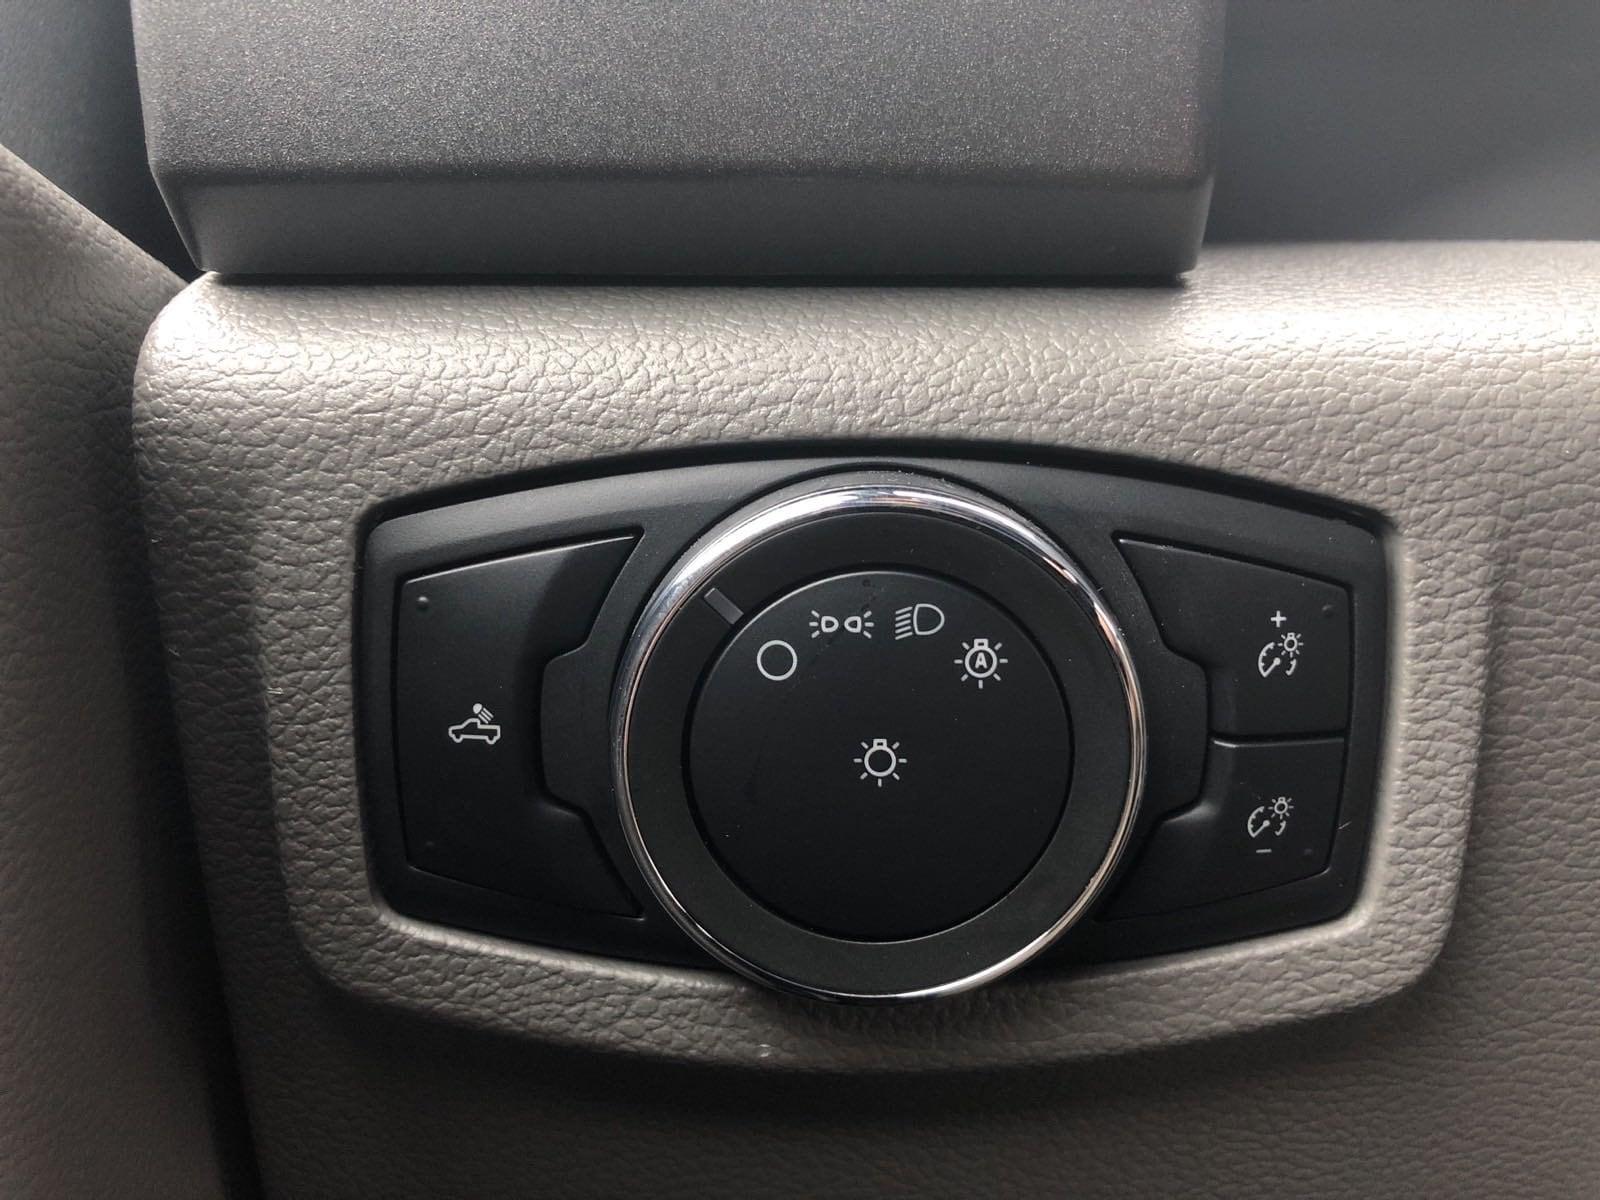 2019 F-550 Super Cab DRW 4x4, Knapheide Contractor Body #299961 - photo 25